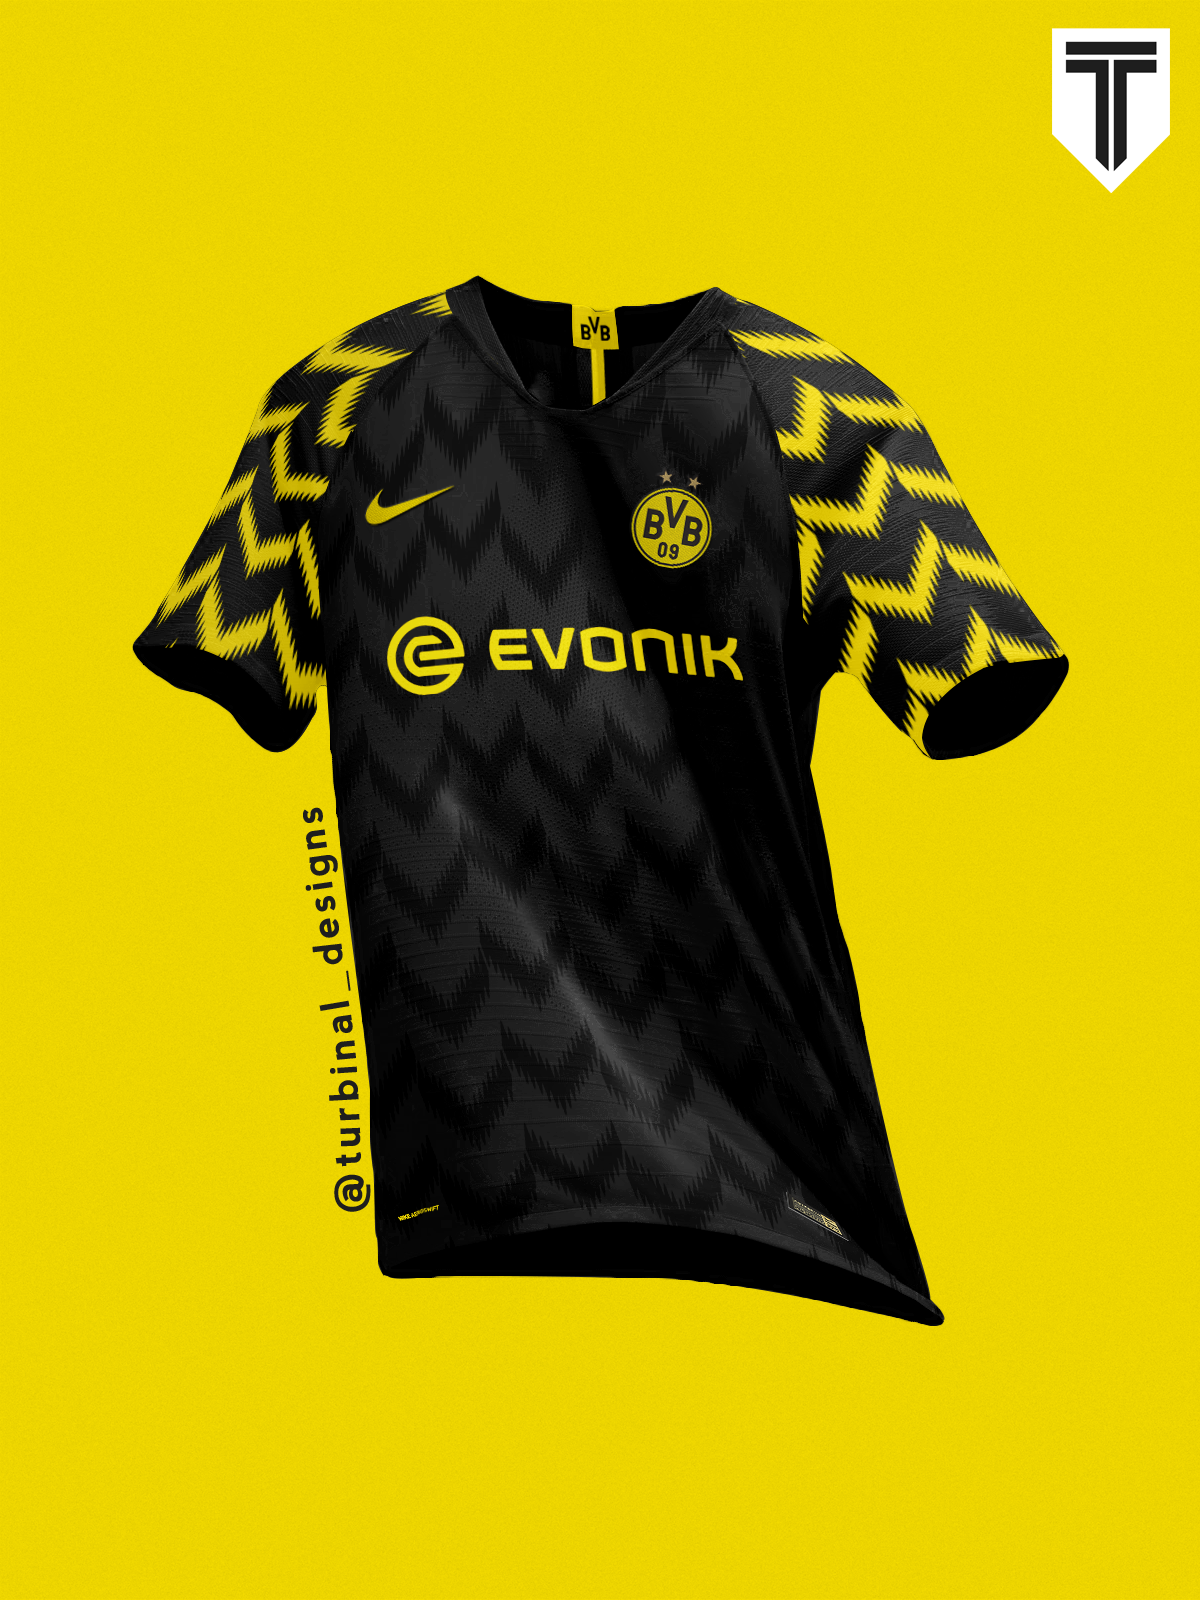 quality design c6cec 942c2 Borussia Dortmund Nike Away Concept Kit